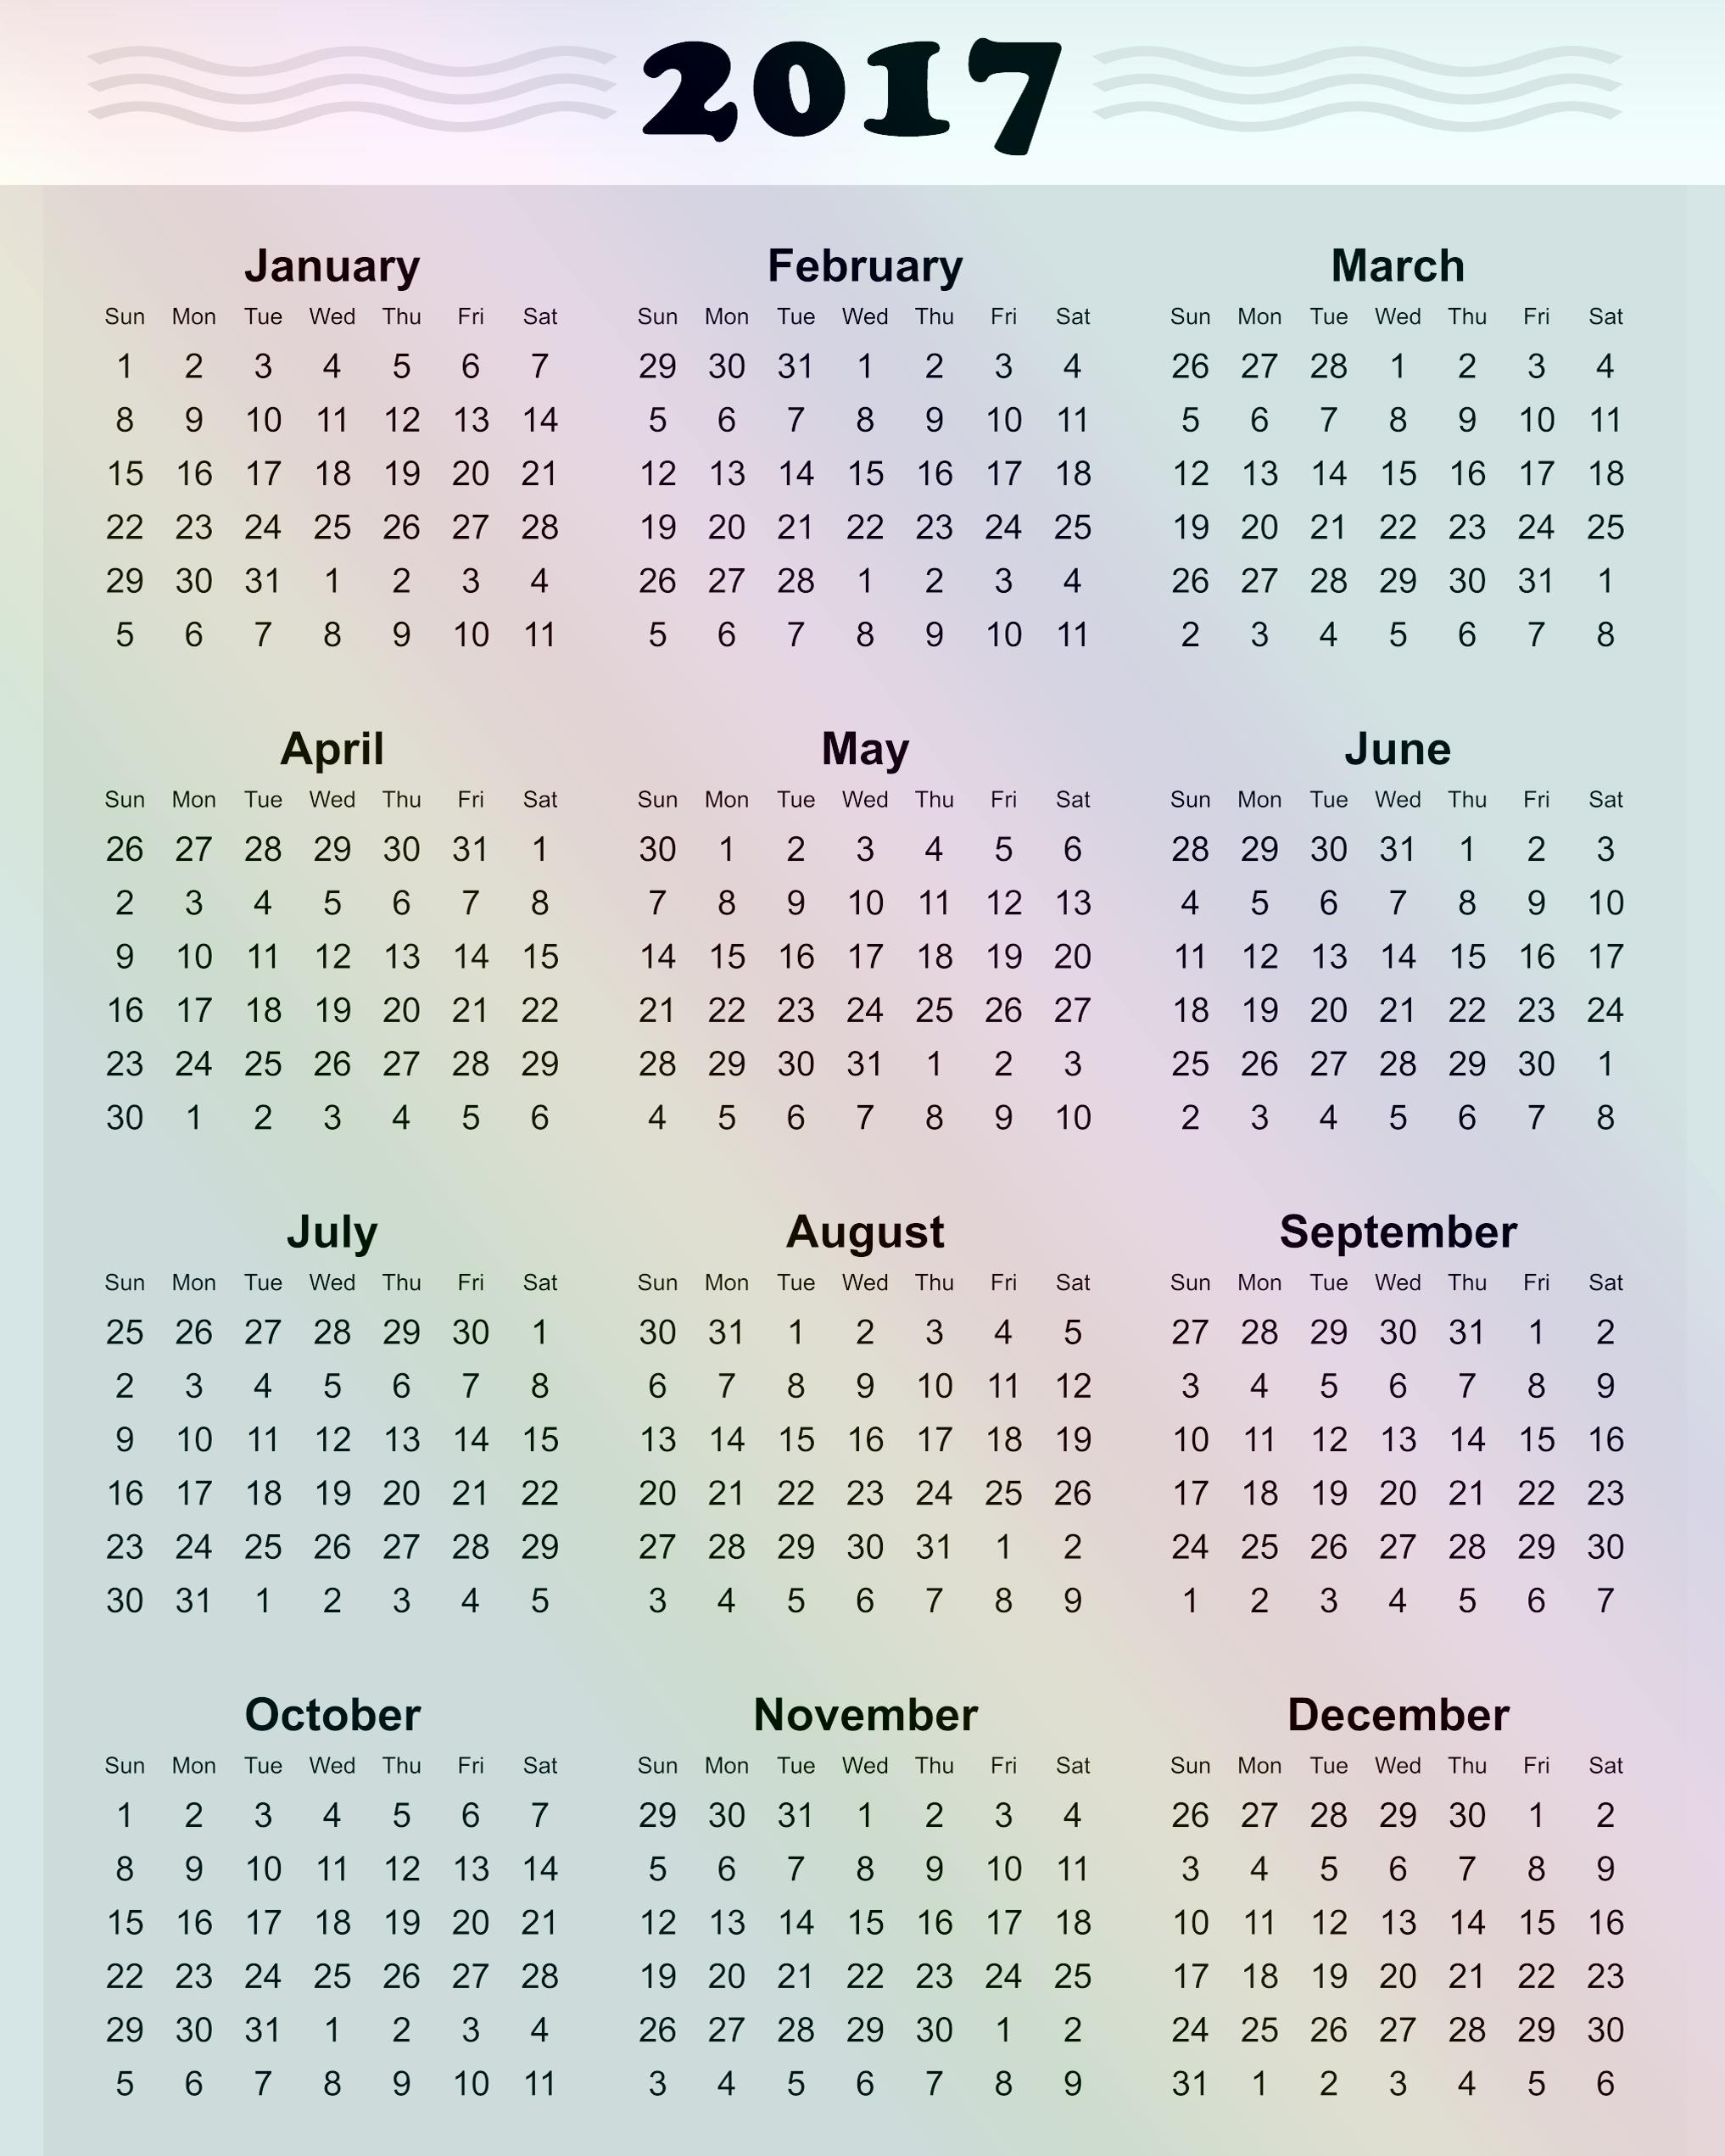 2017 Year Calendar Printable Free New 2017 Printable Calendar Template Holidays Excel & Word